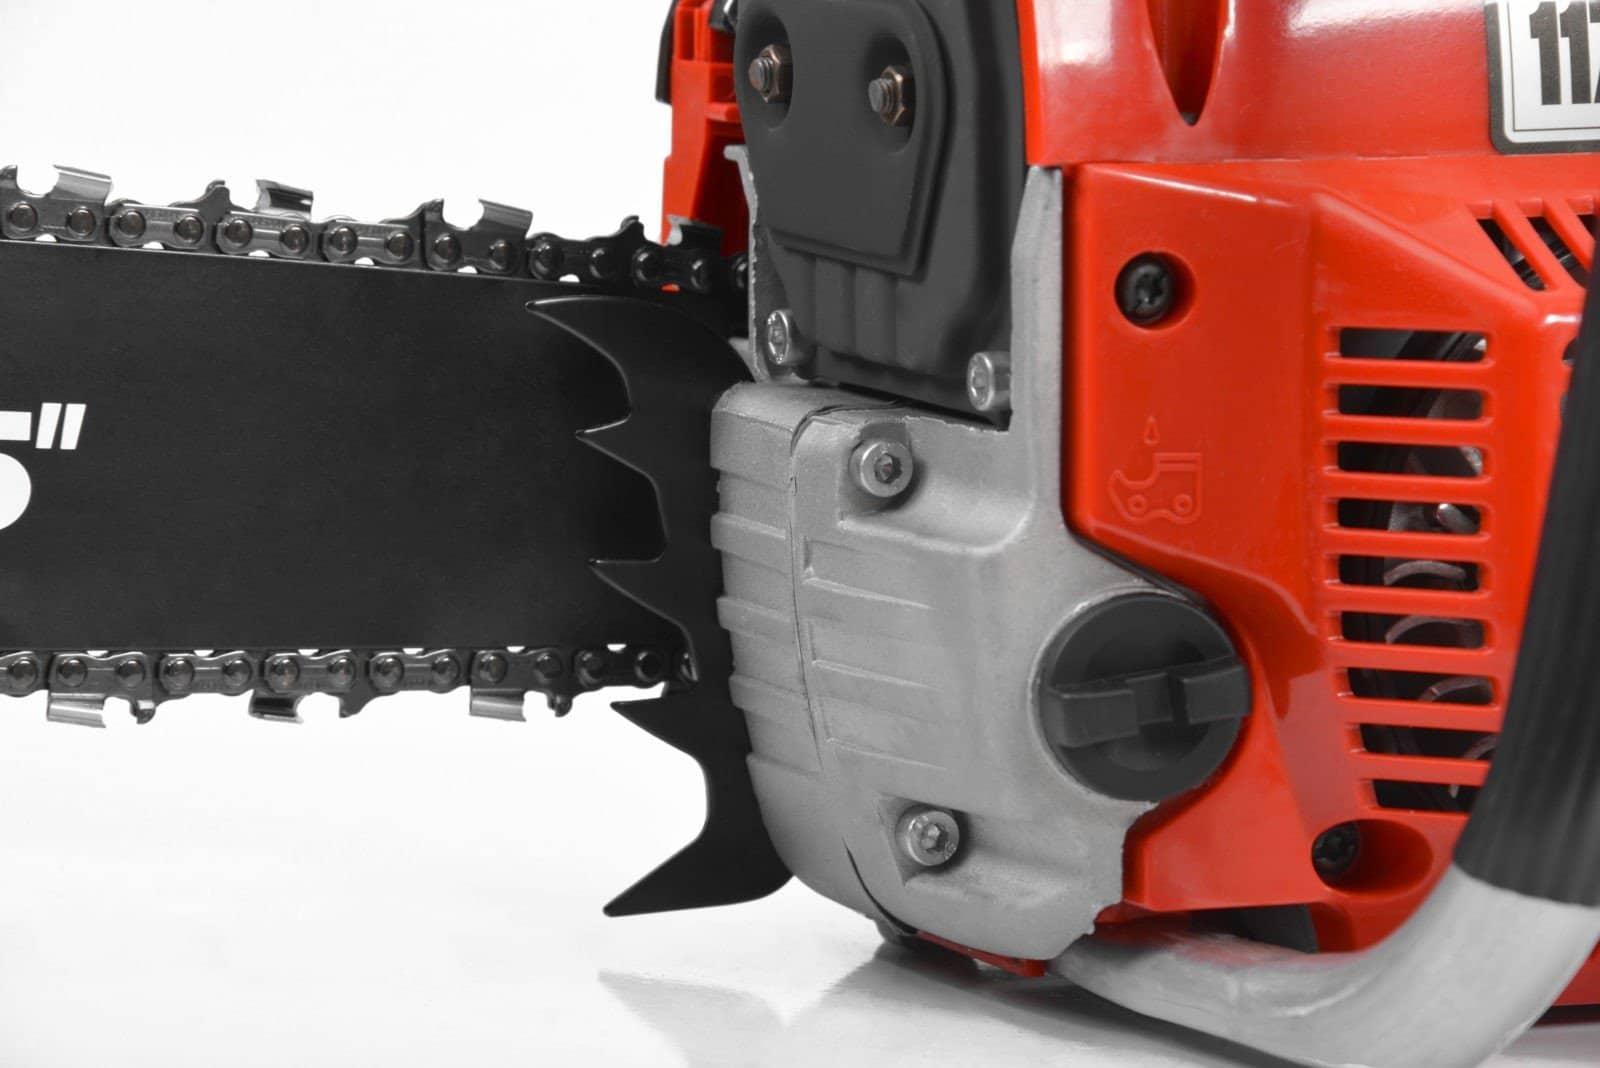 Motosserra HCT CS 50 - 3HP